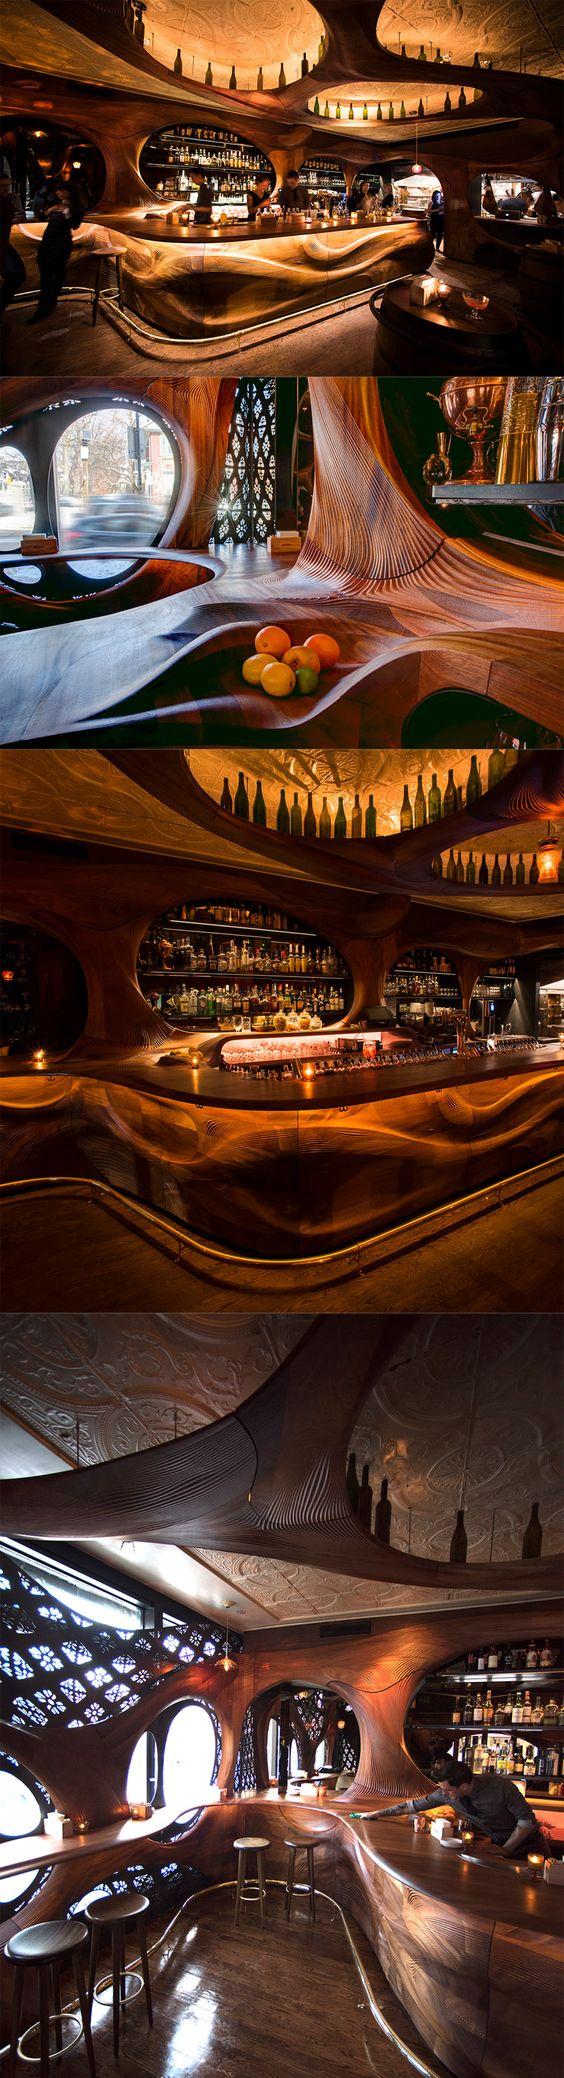 Art Nouveau Bar Raval - Toronto, Canada | http://knstrct.com/interior-design-blog/2015/6/3/pintxo-partisans-revisits-art-nouveau-with-bar-raval